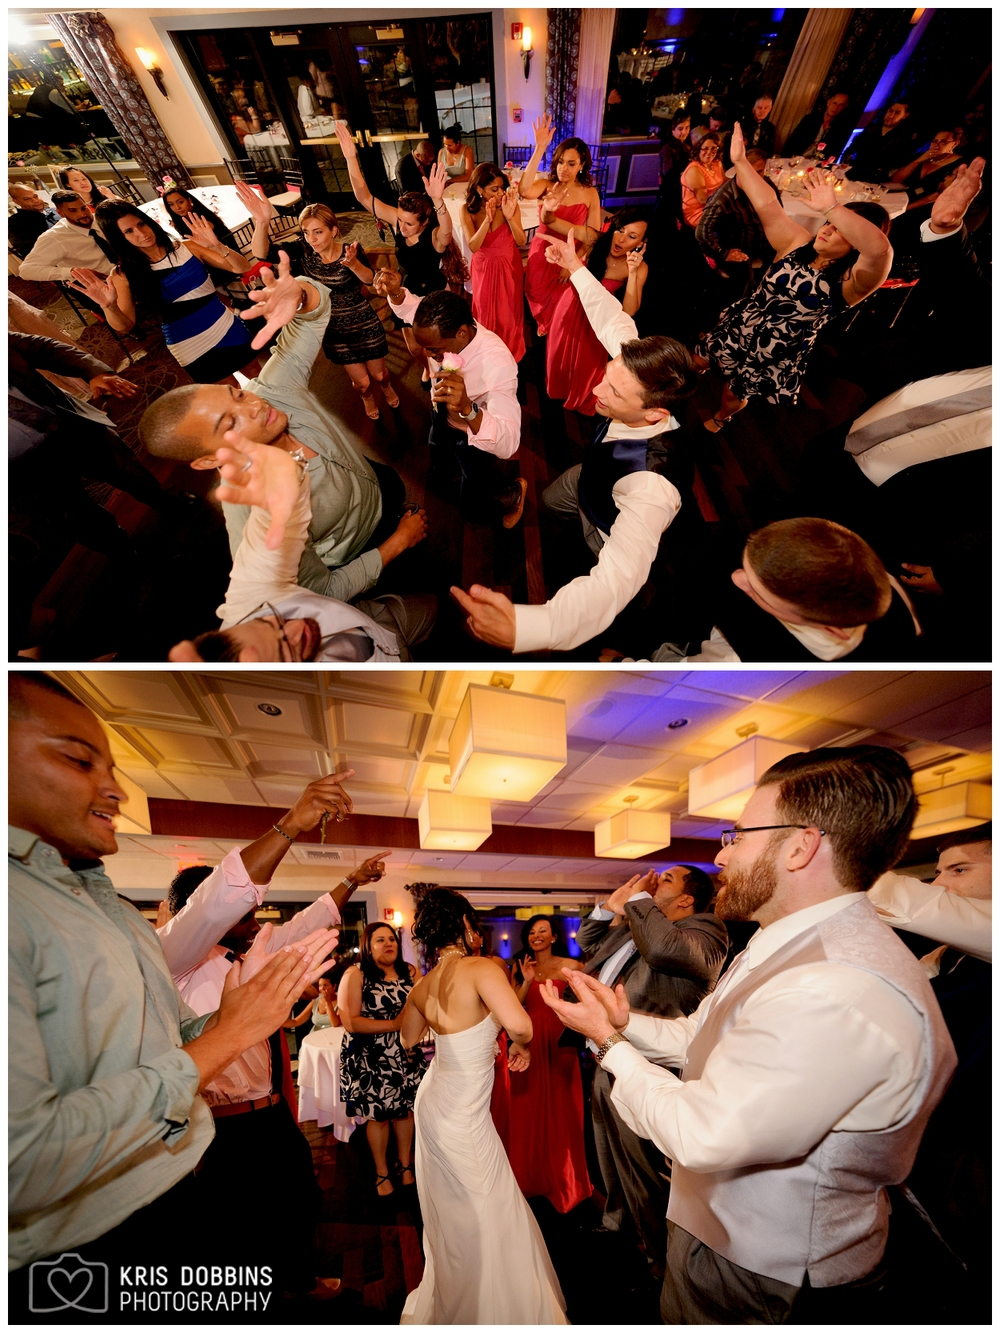 kdp_copyrighted_wedding_blog_bd_image_0031.jpg